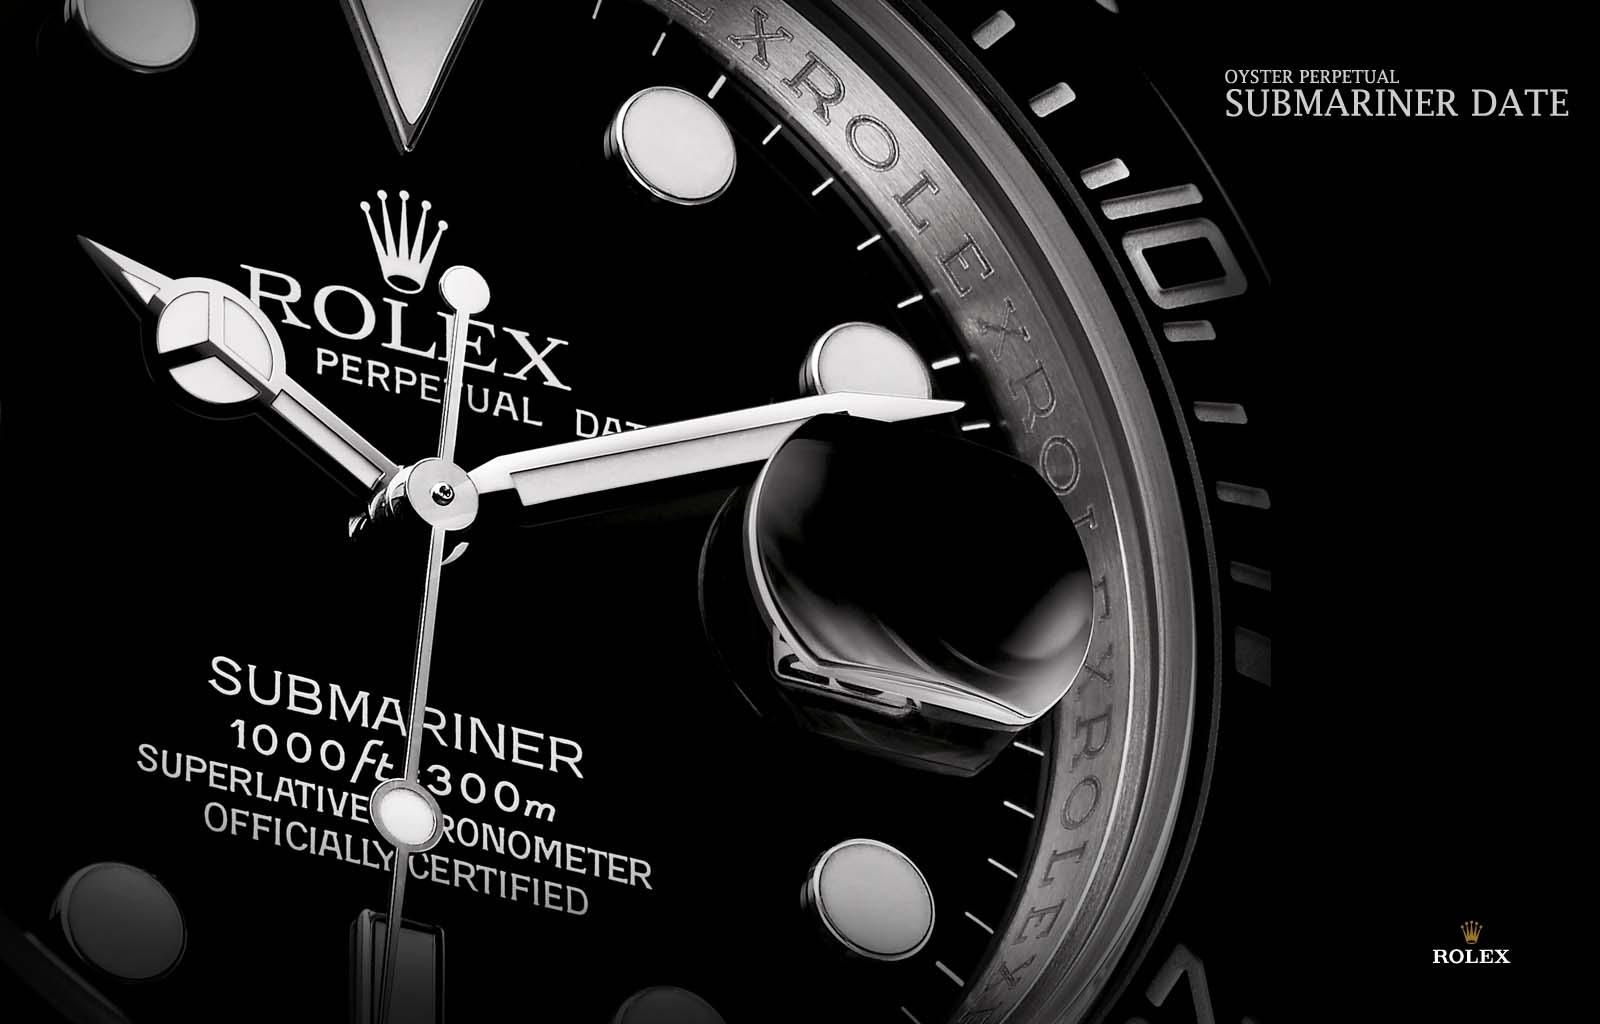 Rolex Wallpaper iPhone 6 on WallpaperSafari